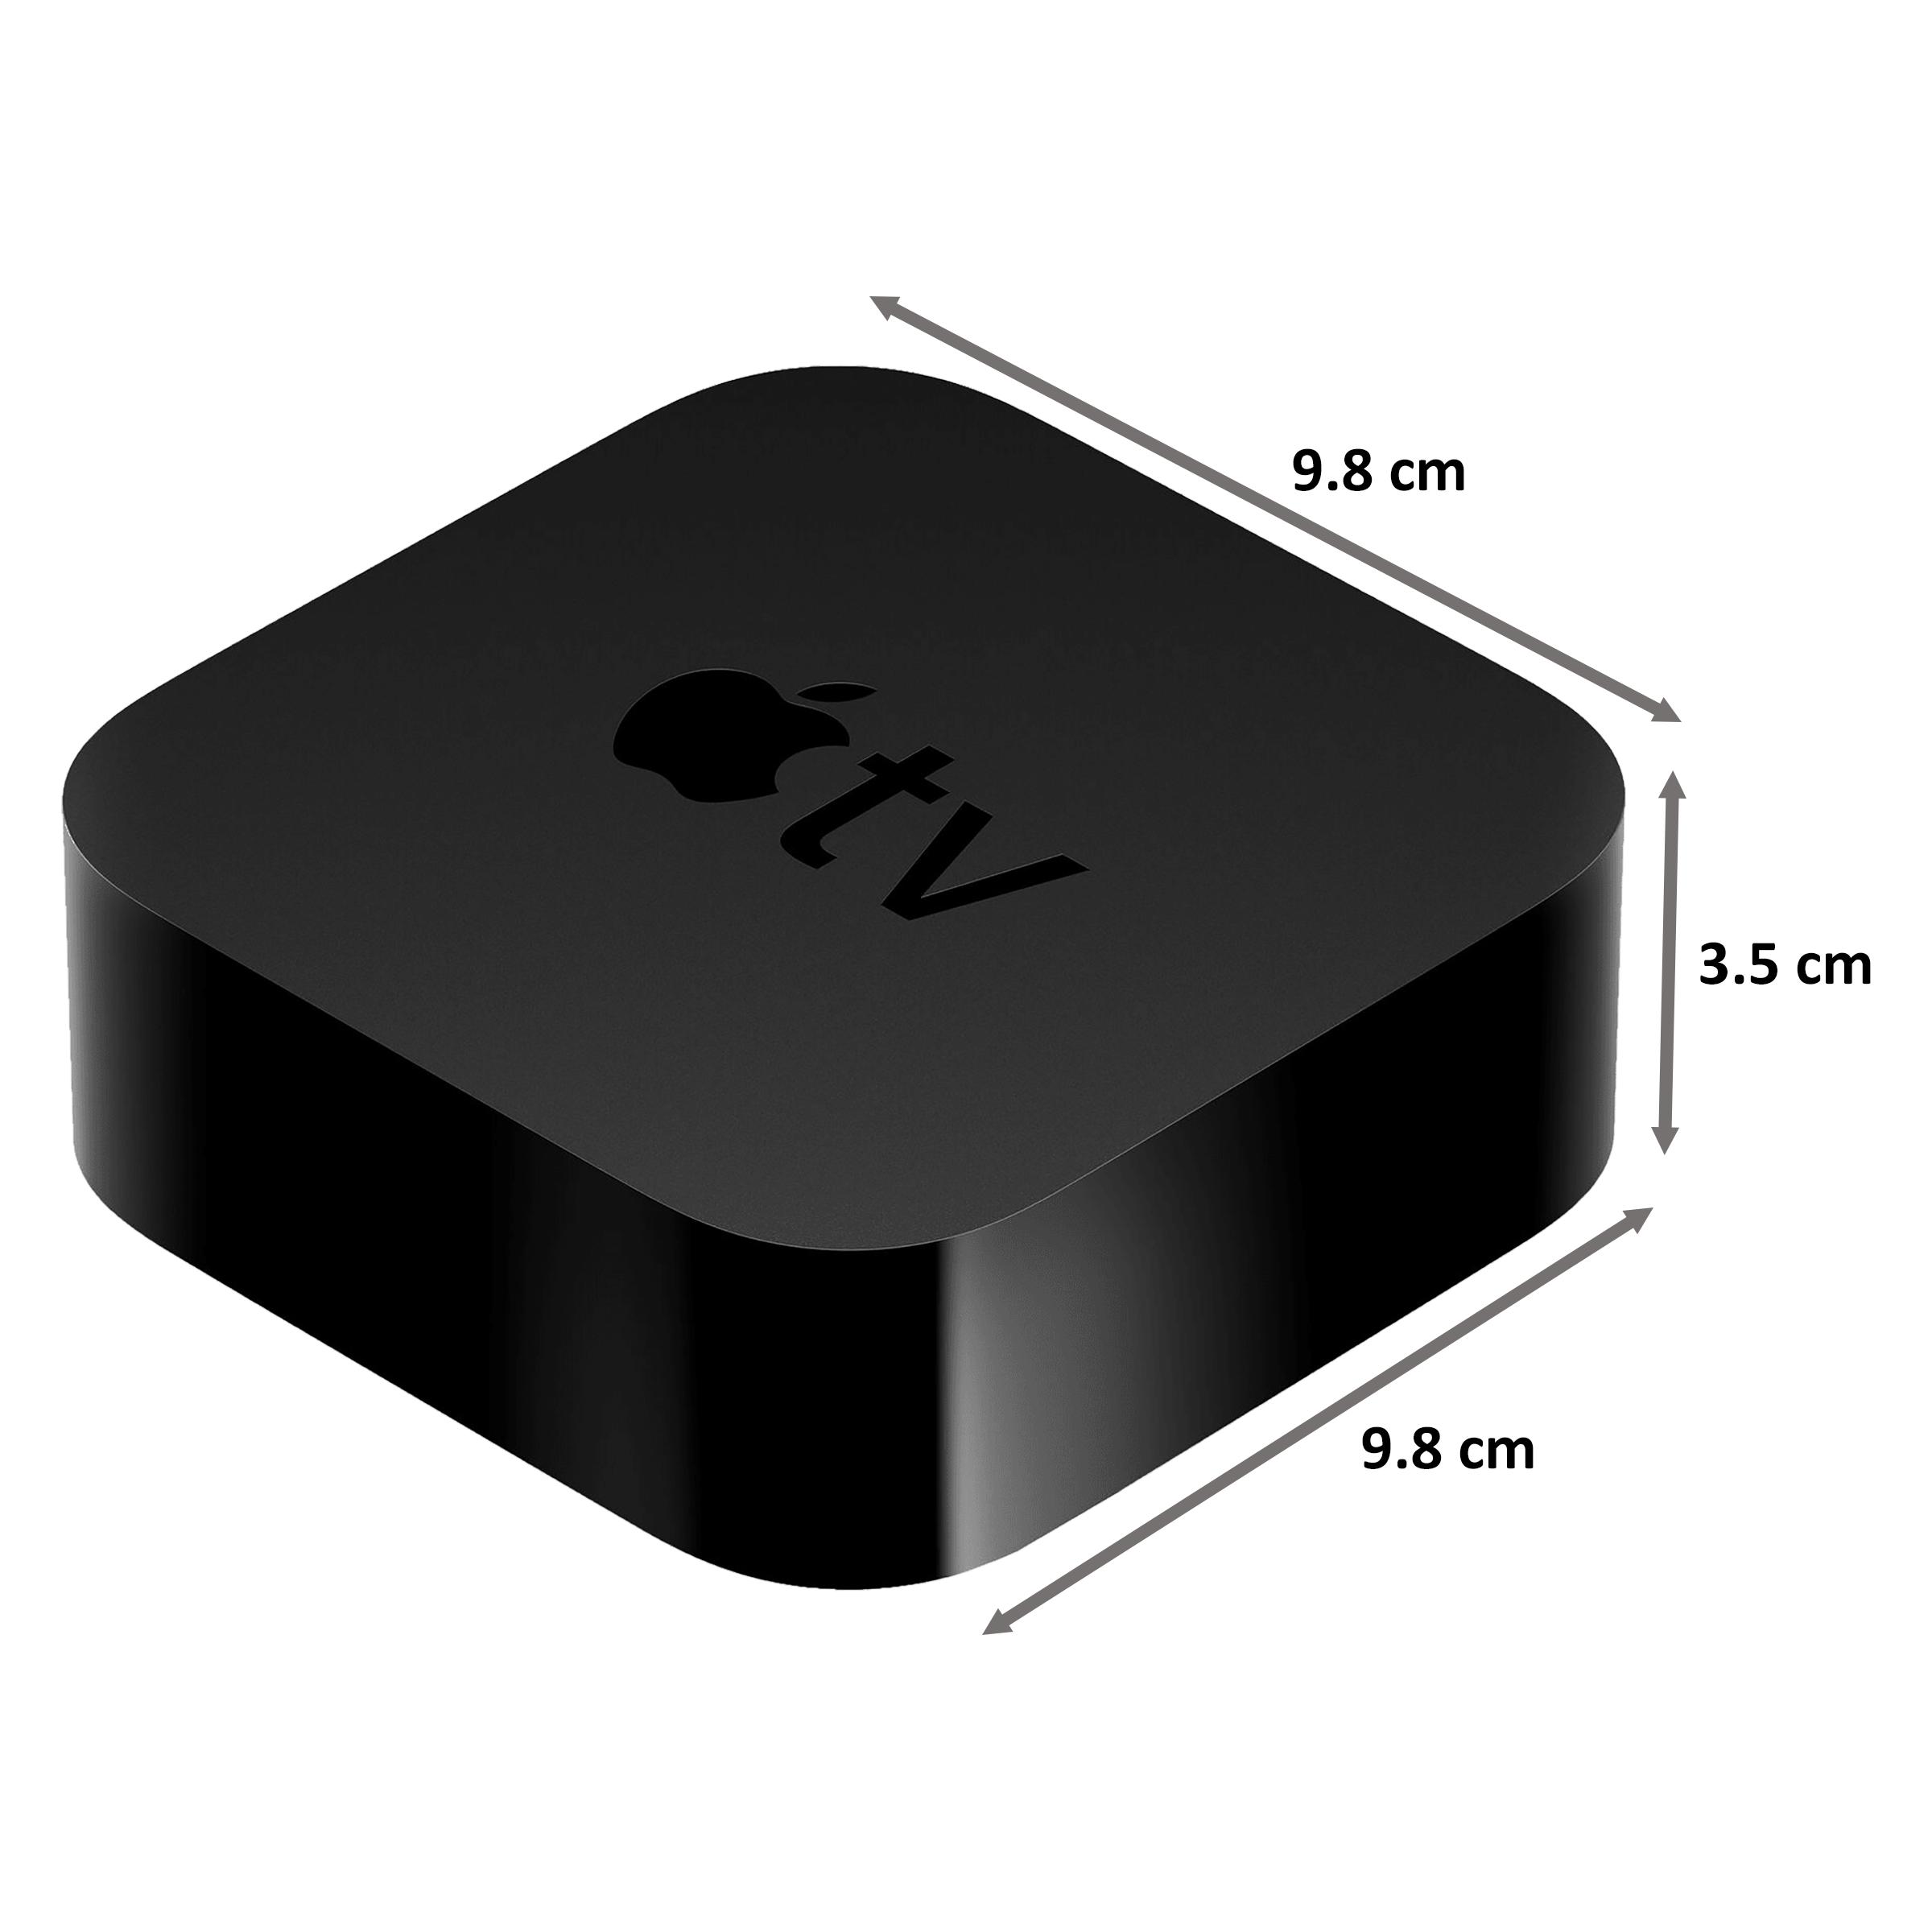 Apple TV 4K 32GB Media Streaming Box (IR Receiver, MXGY2HN/A, Black) 2